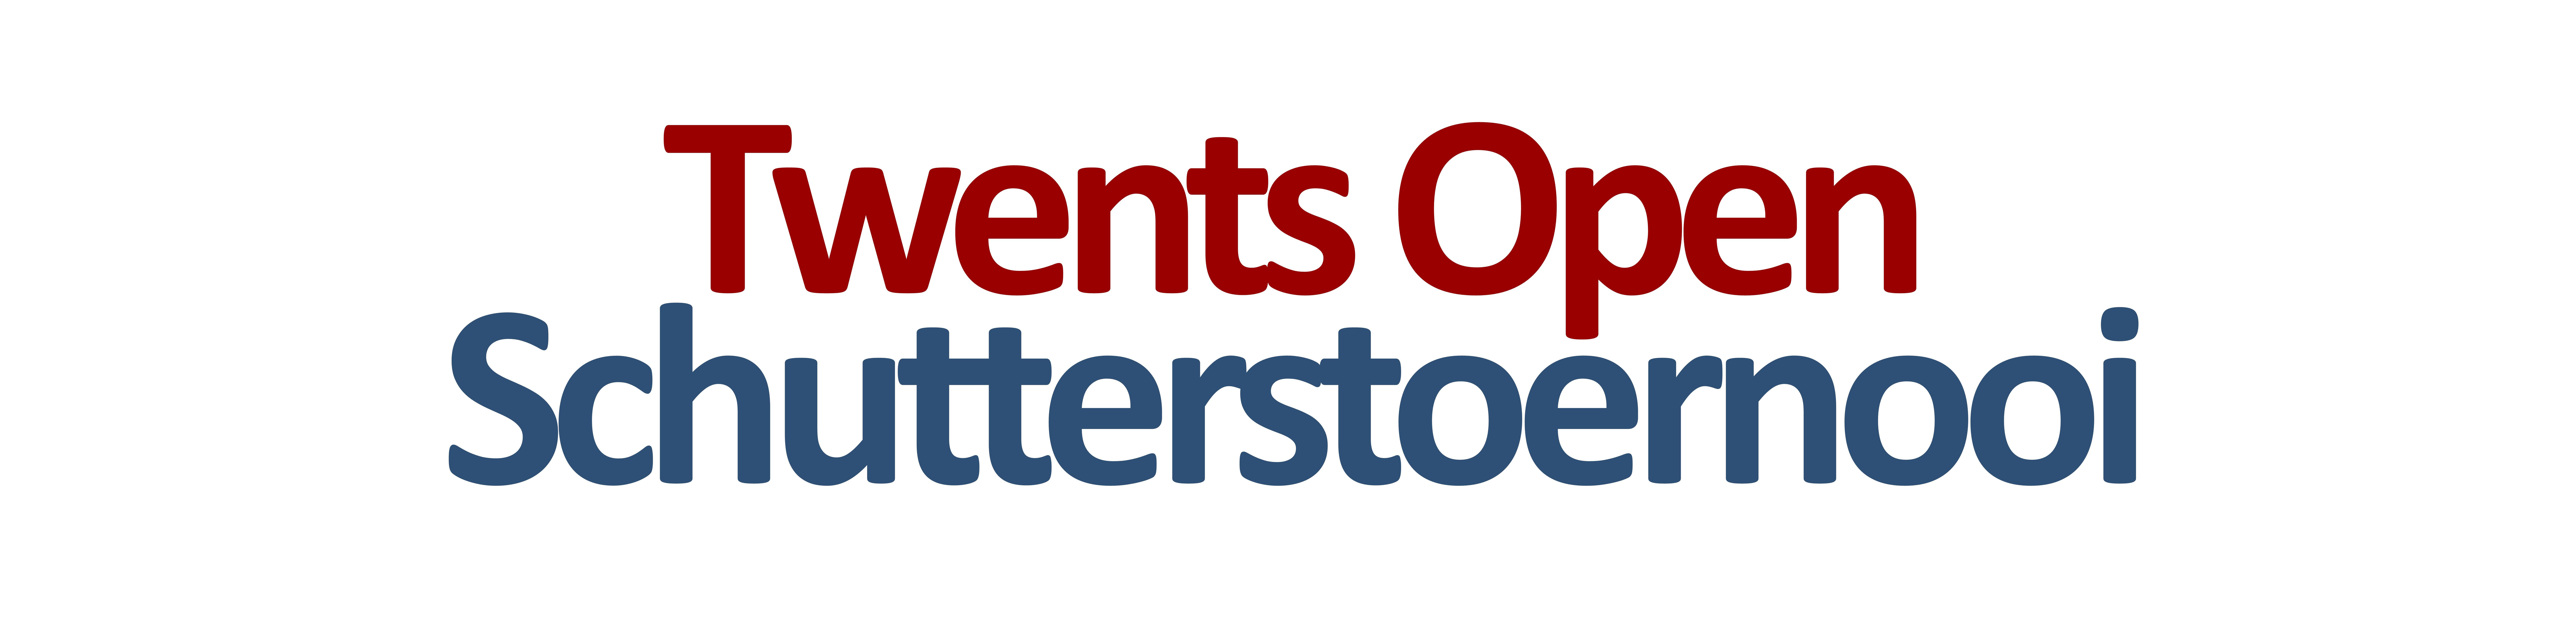 Twents Open Schutterstoernooi